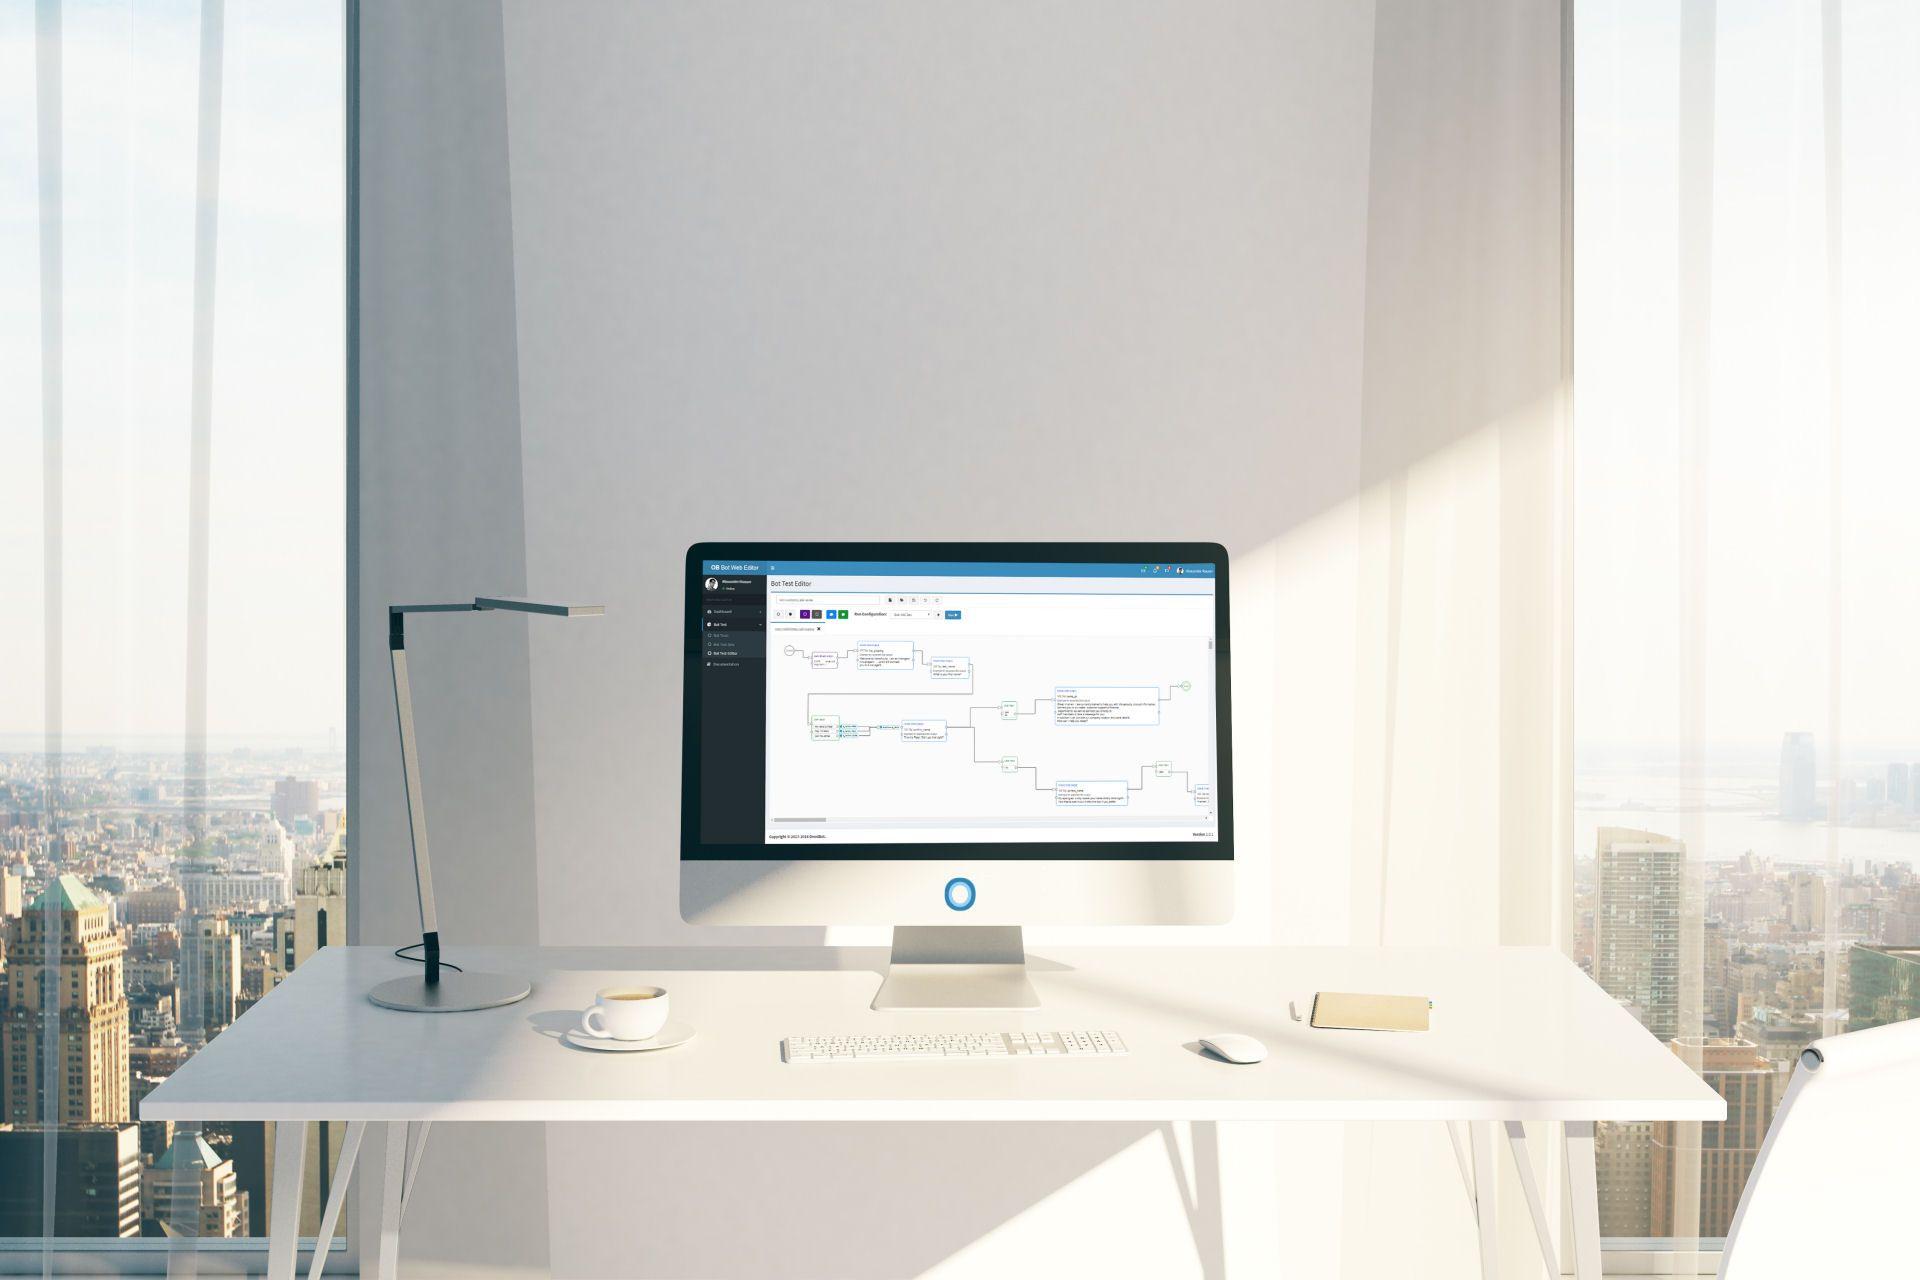 OMNIBOT - Independent, Next Generation Conversational A.I. Platform